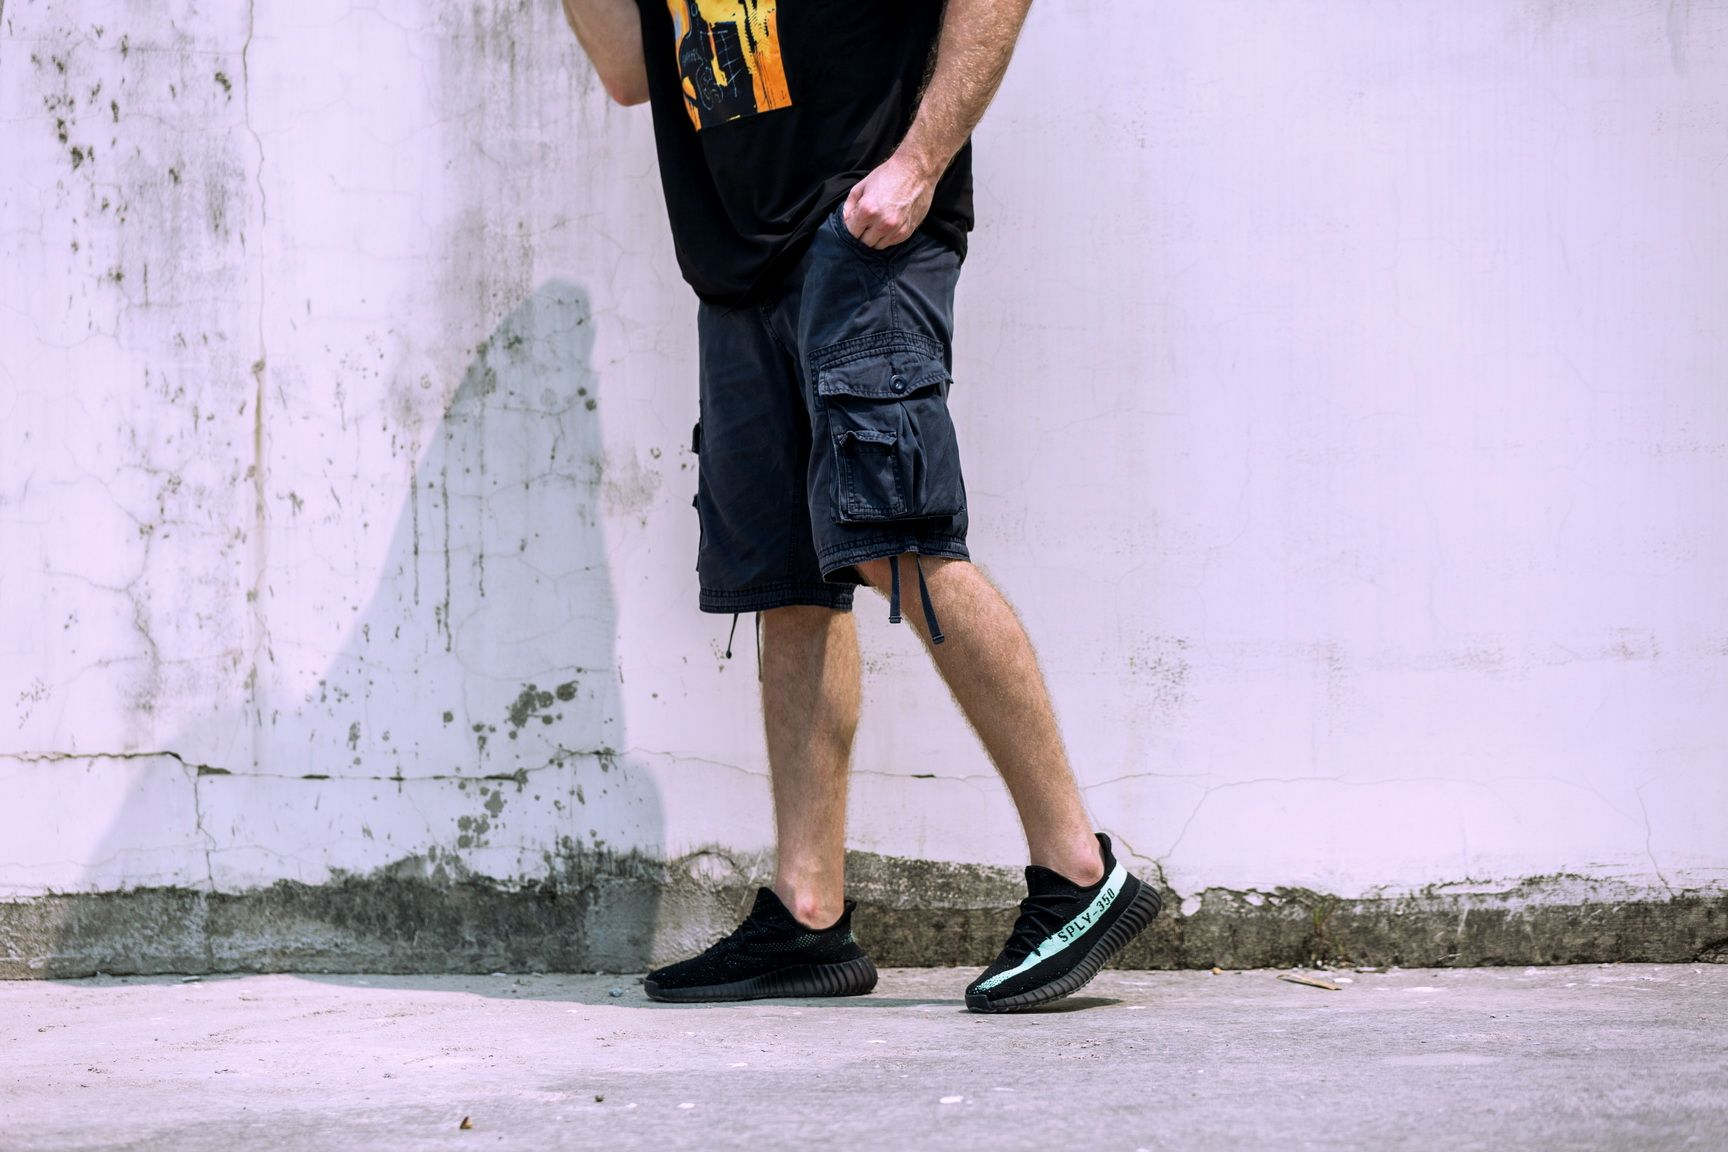 Adidas Yeezy Boost 350 V2 Black-Green 1